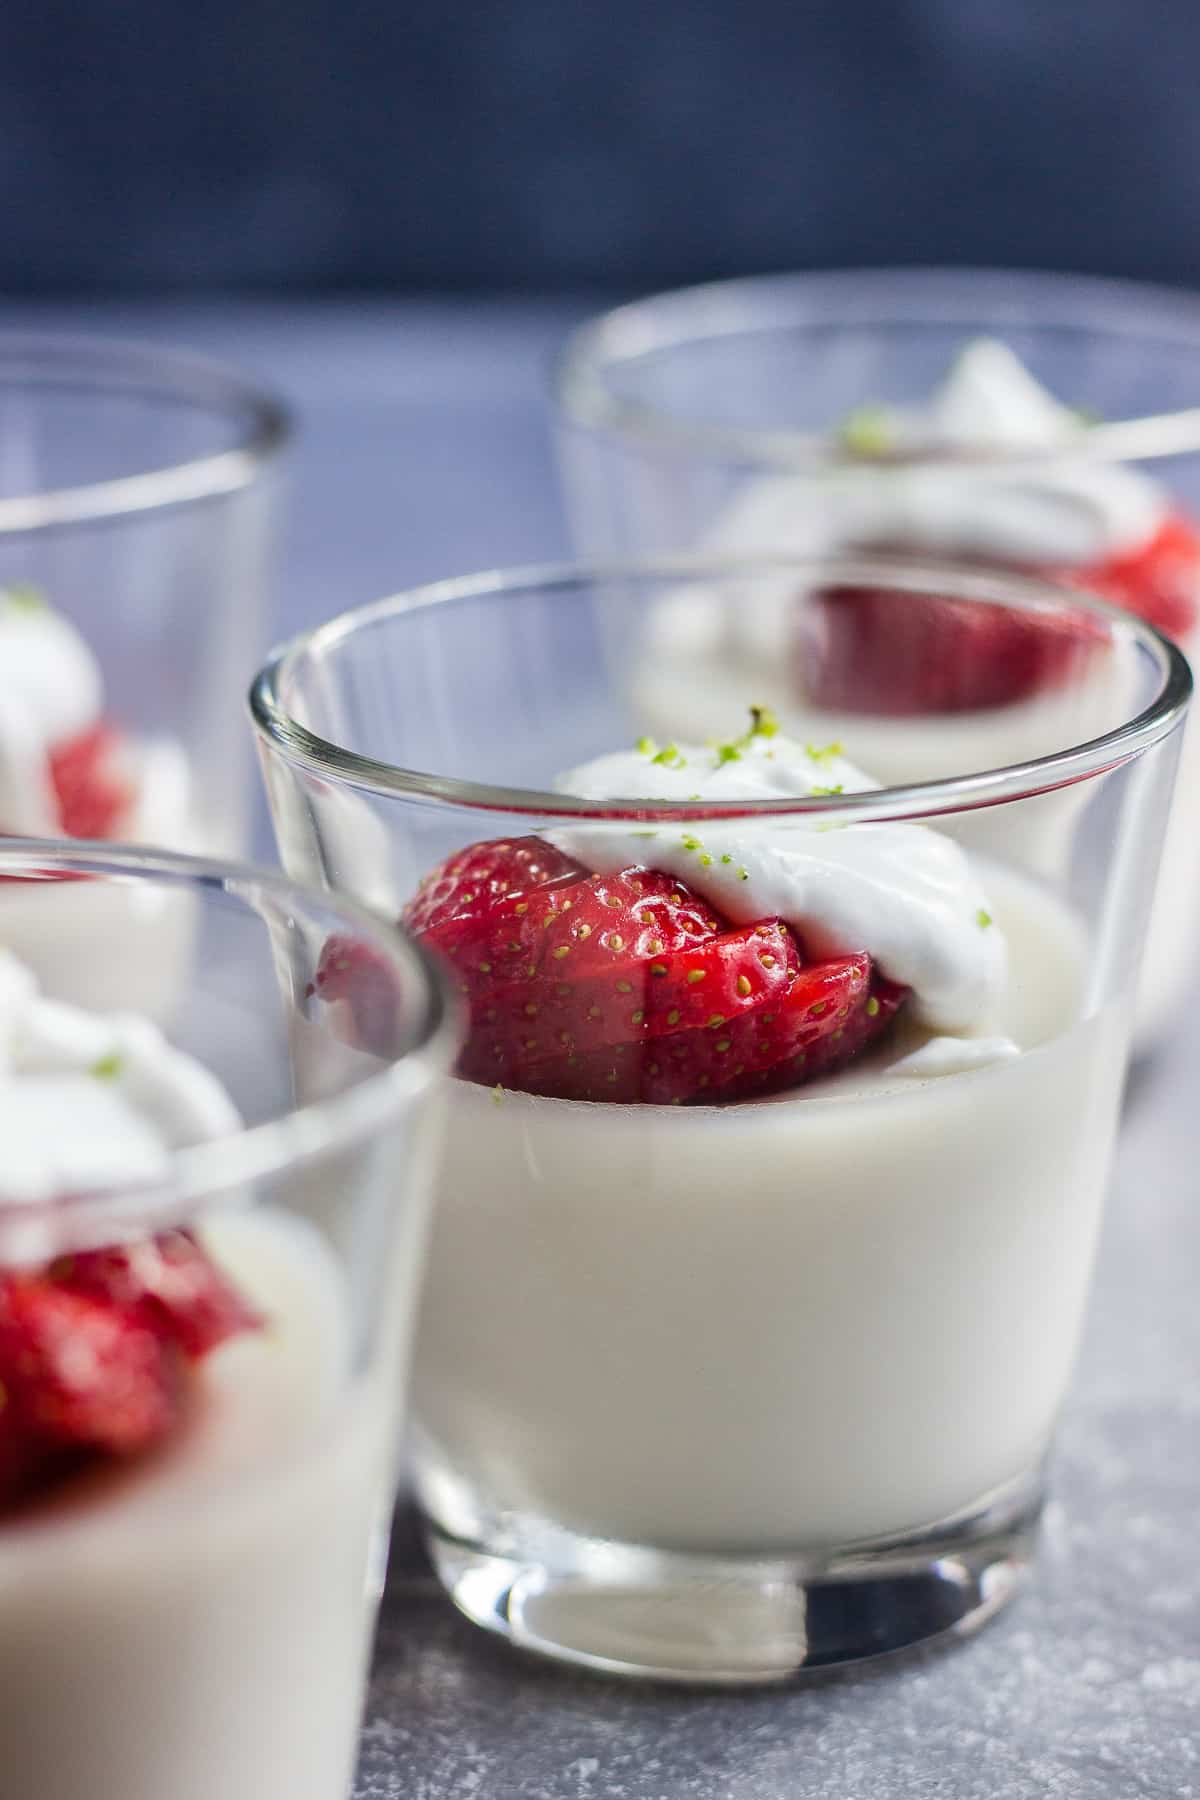 Vegan Posset in glasses garnished with strawberries